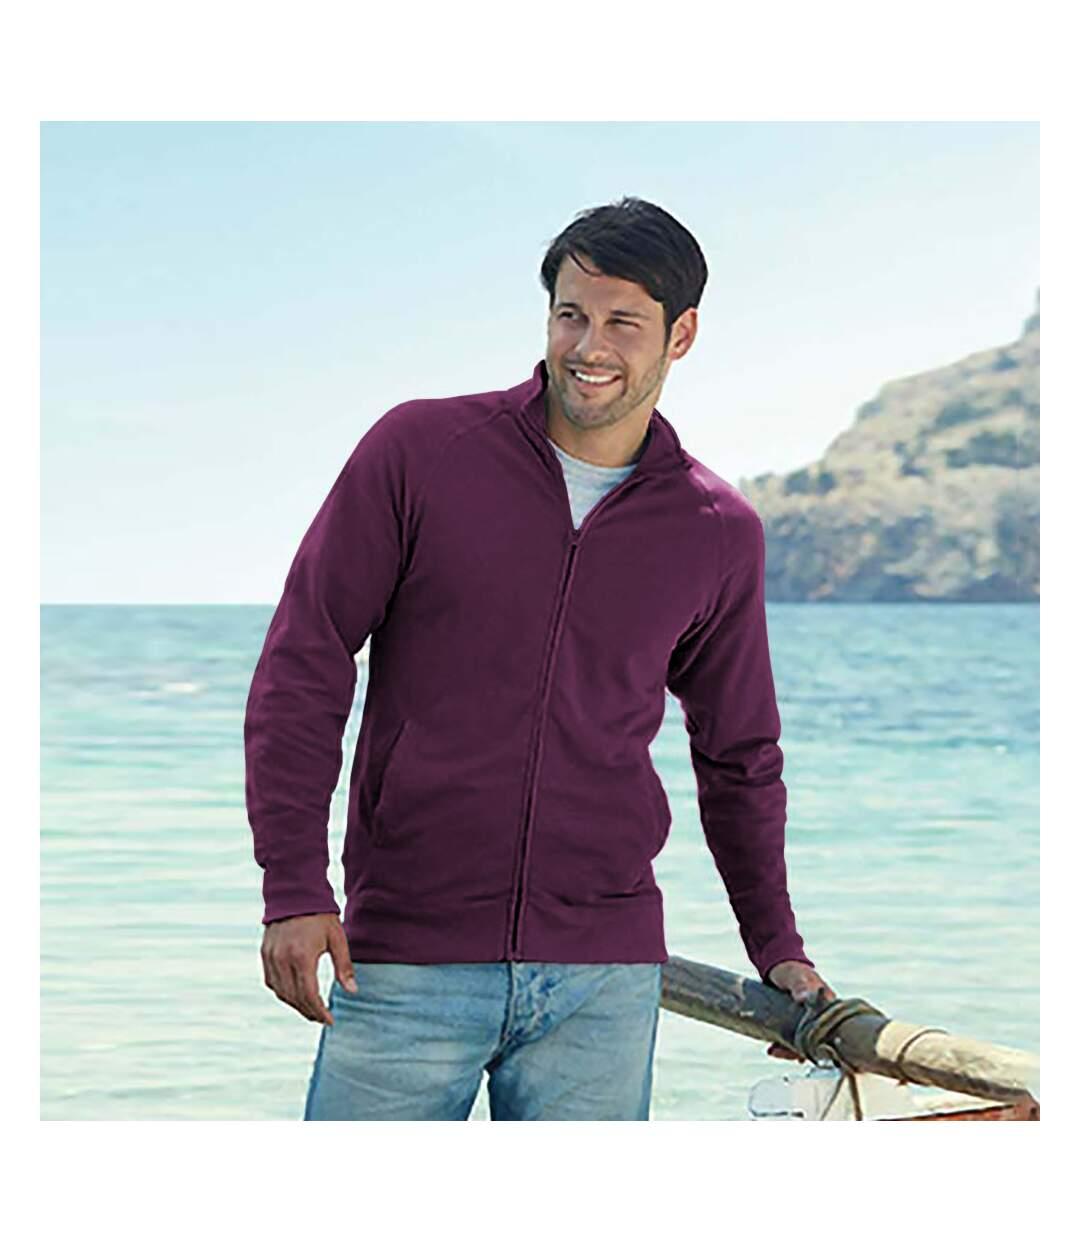 Fruit Of The Loom Mens Lightweight Full Zip Sweatshirt Jacket (Burgundy) - UTRW4500